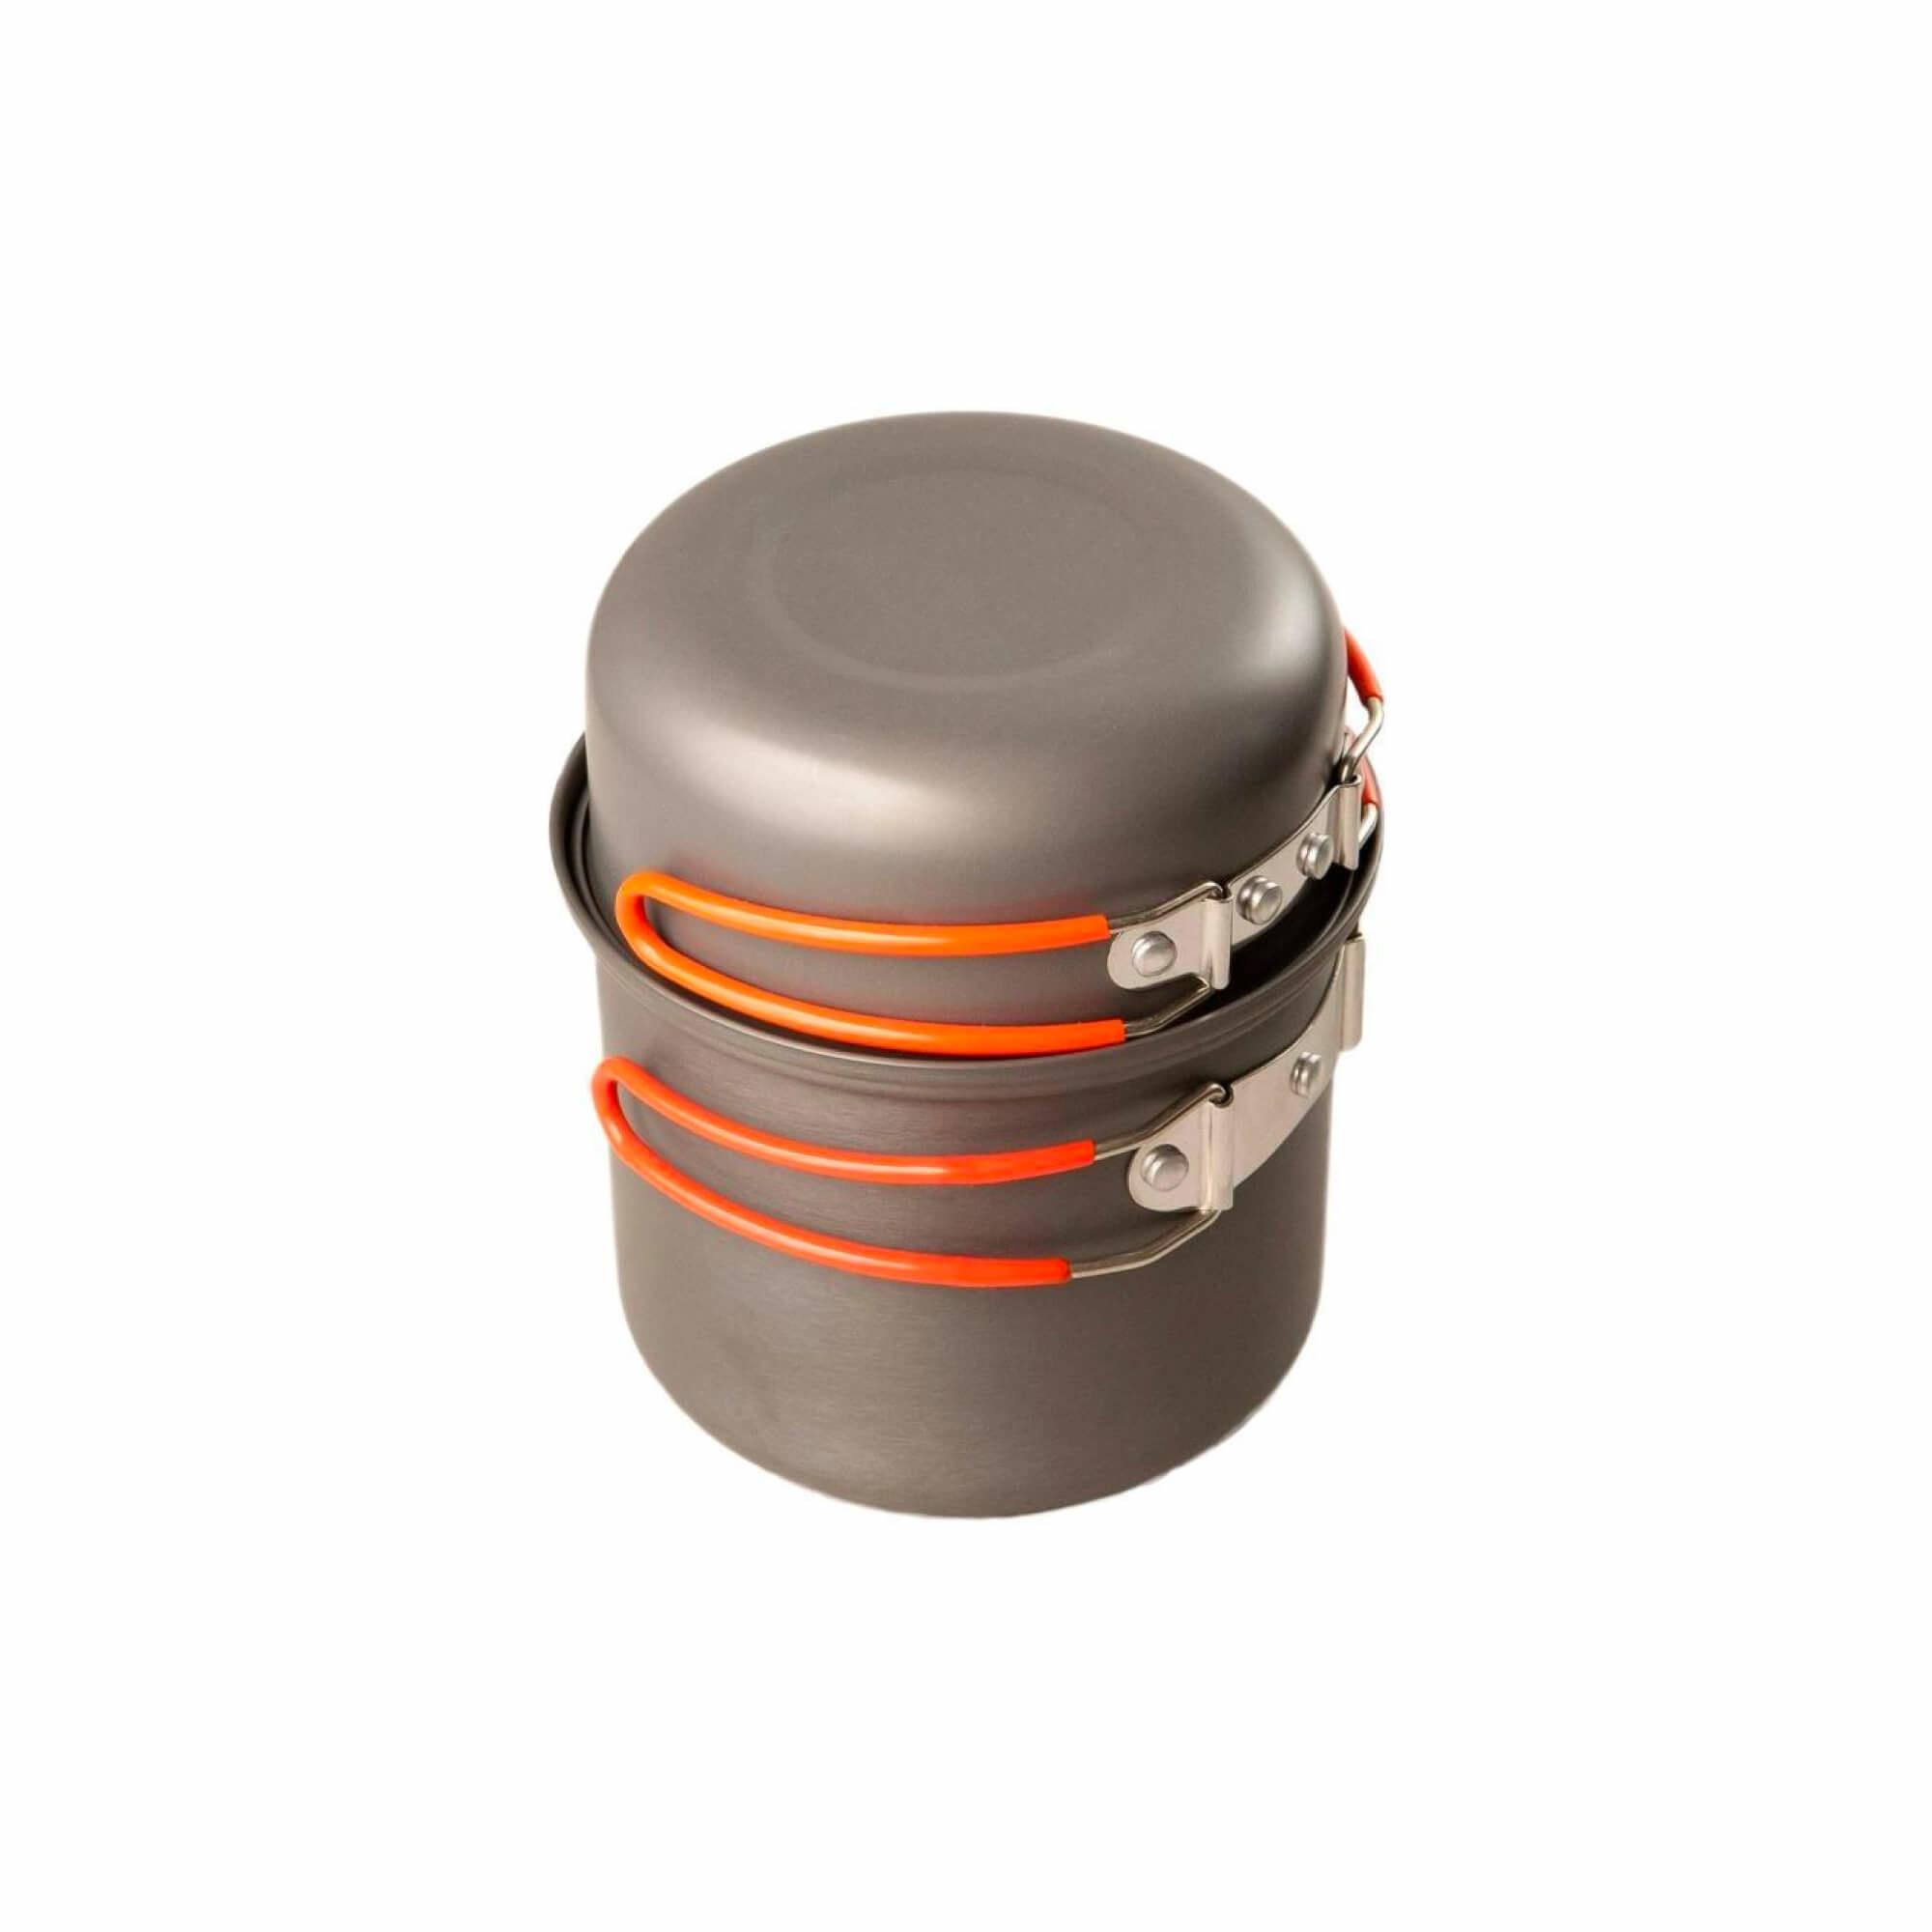 Furno Stove & Pot Set-4